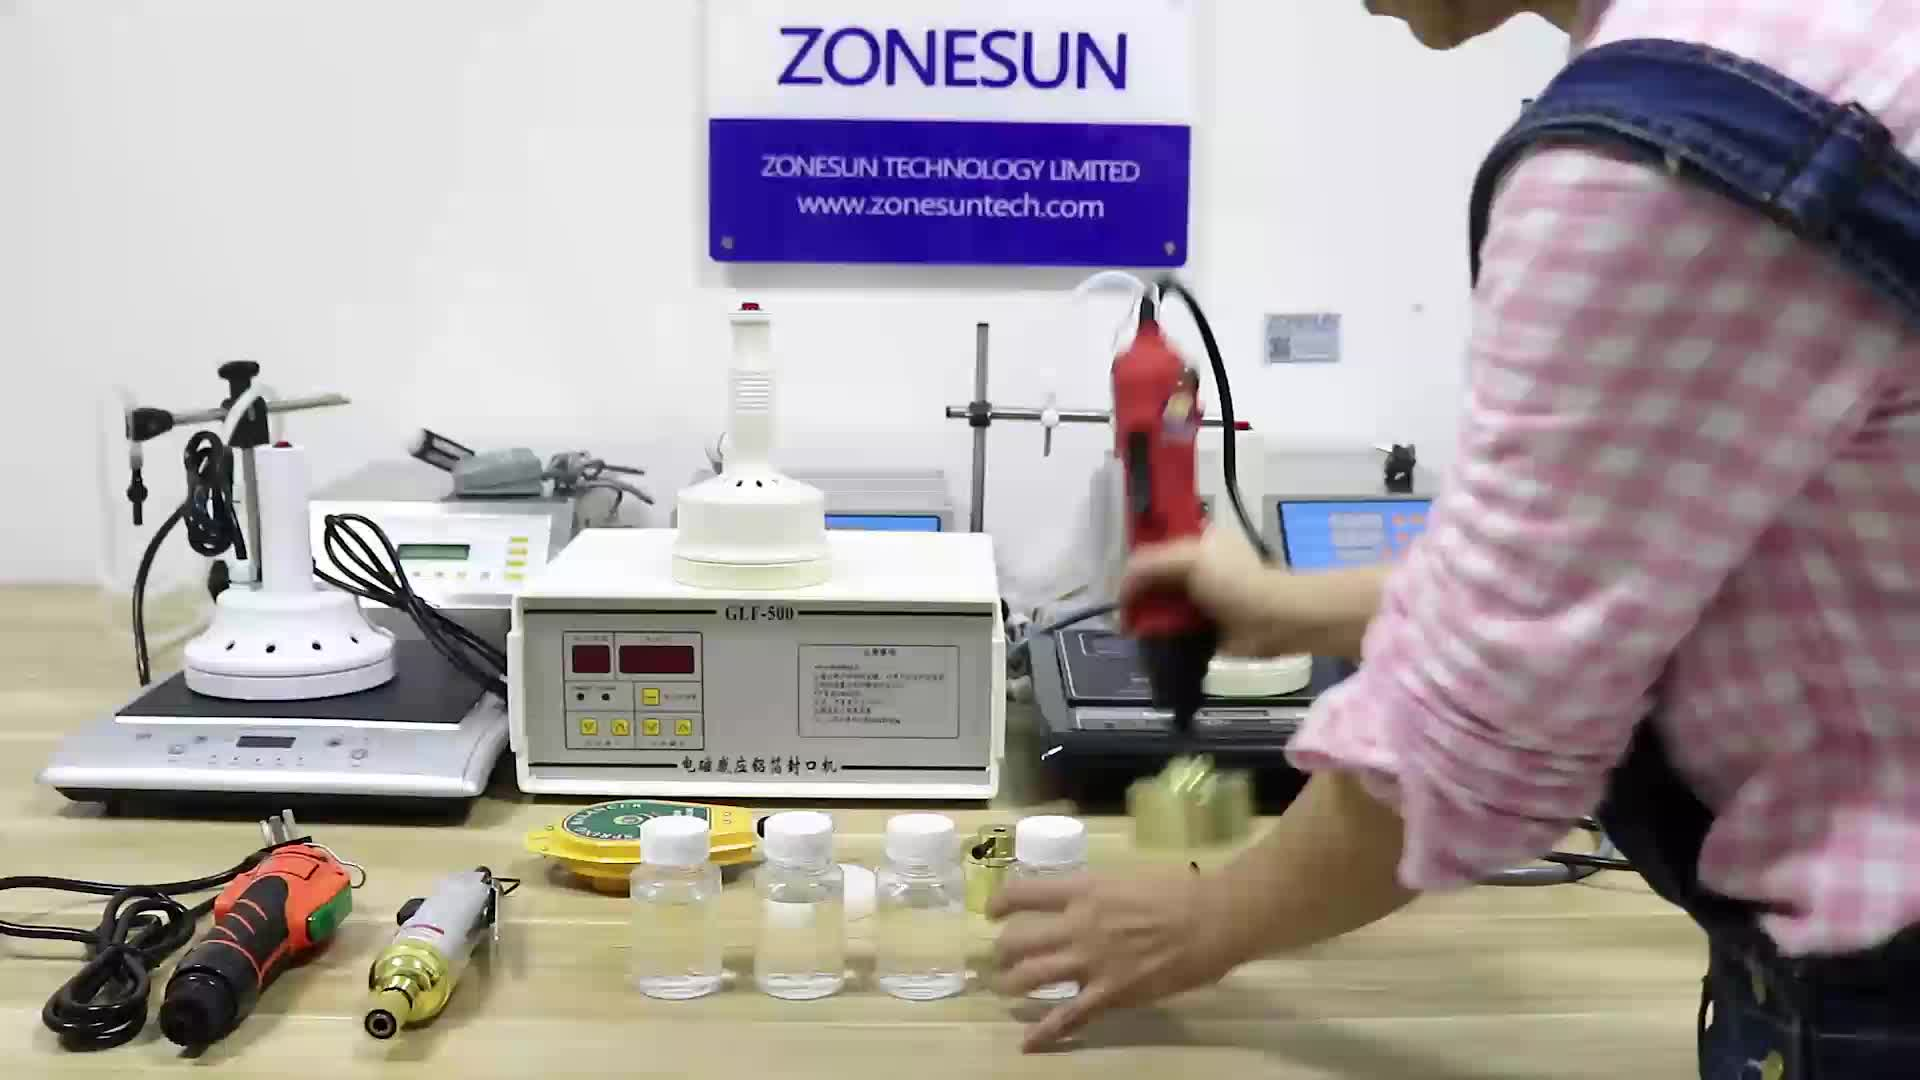 ZONESUN SG-1550 Portable automatic electric bottle capping machine Cap screwing Machine electric cap sealing machine